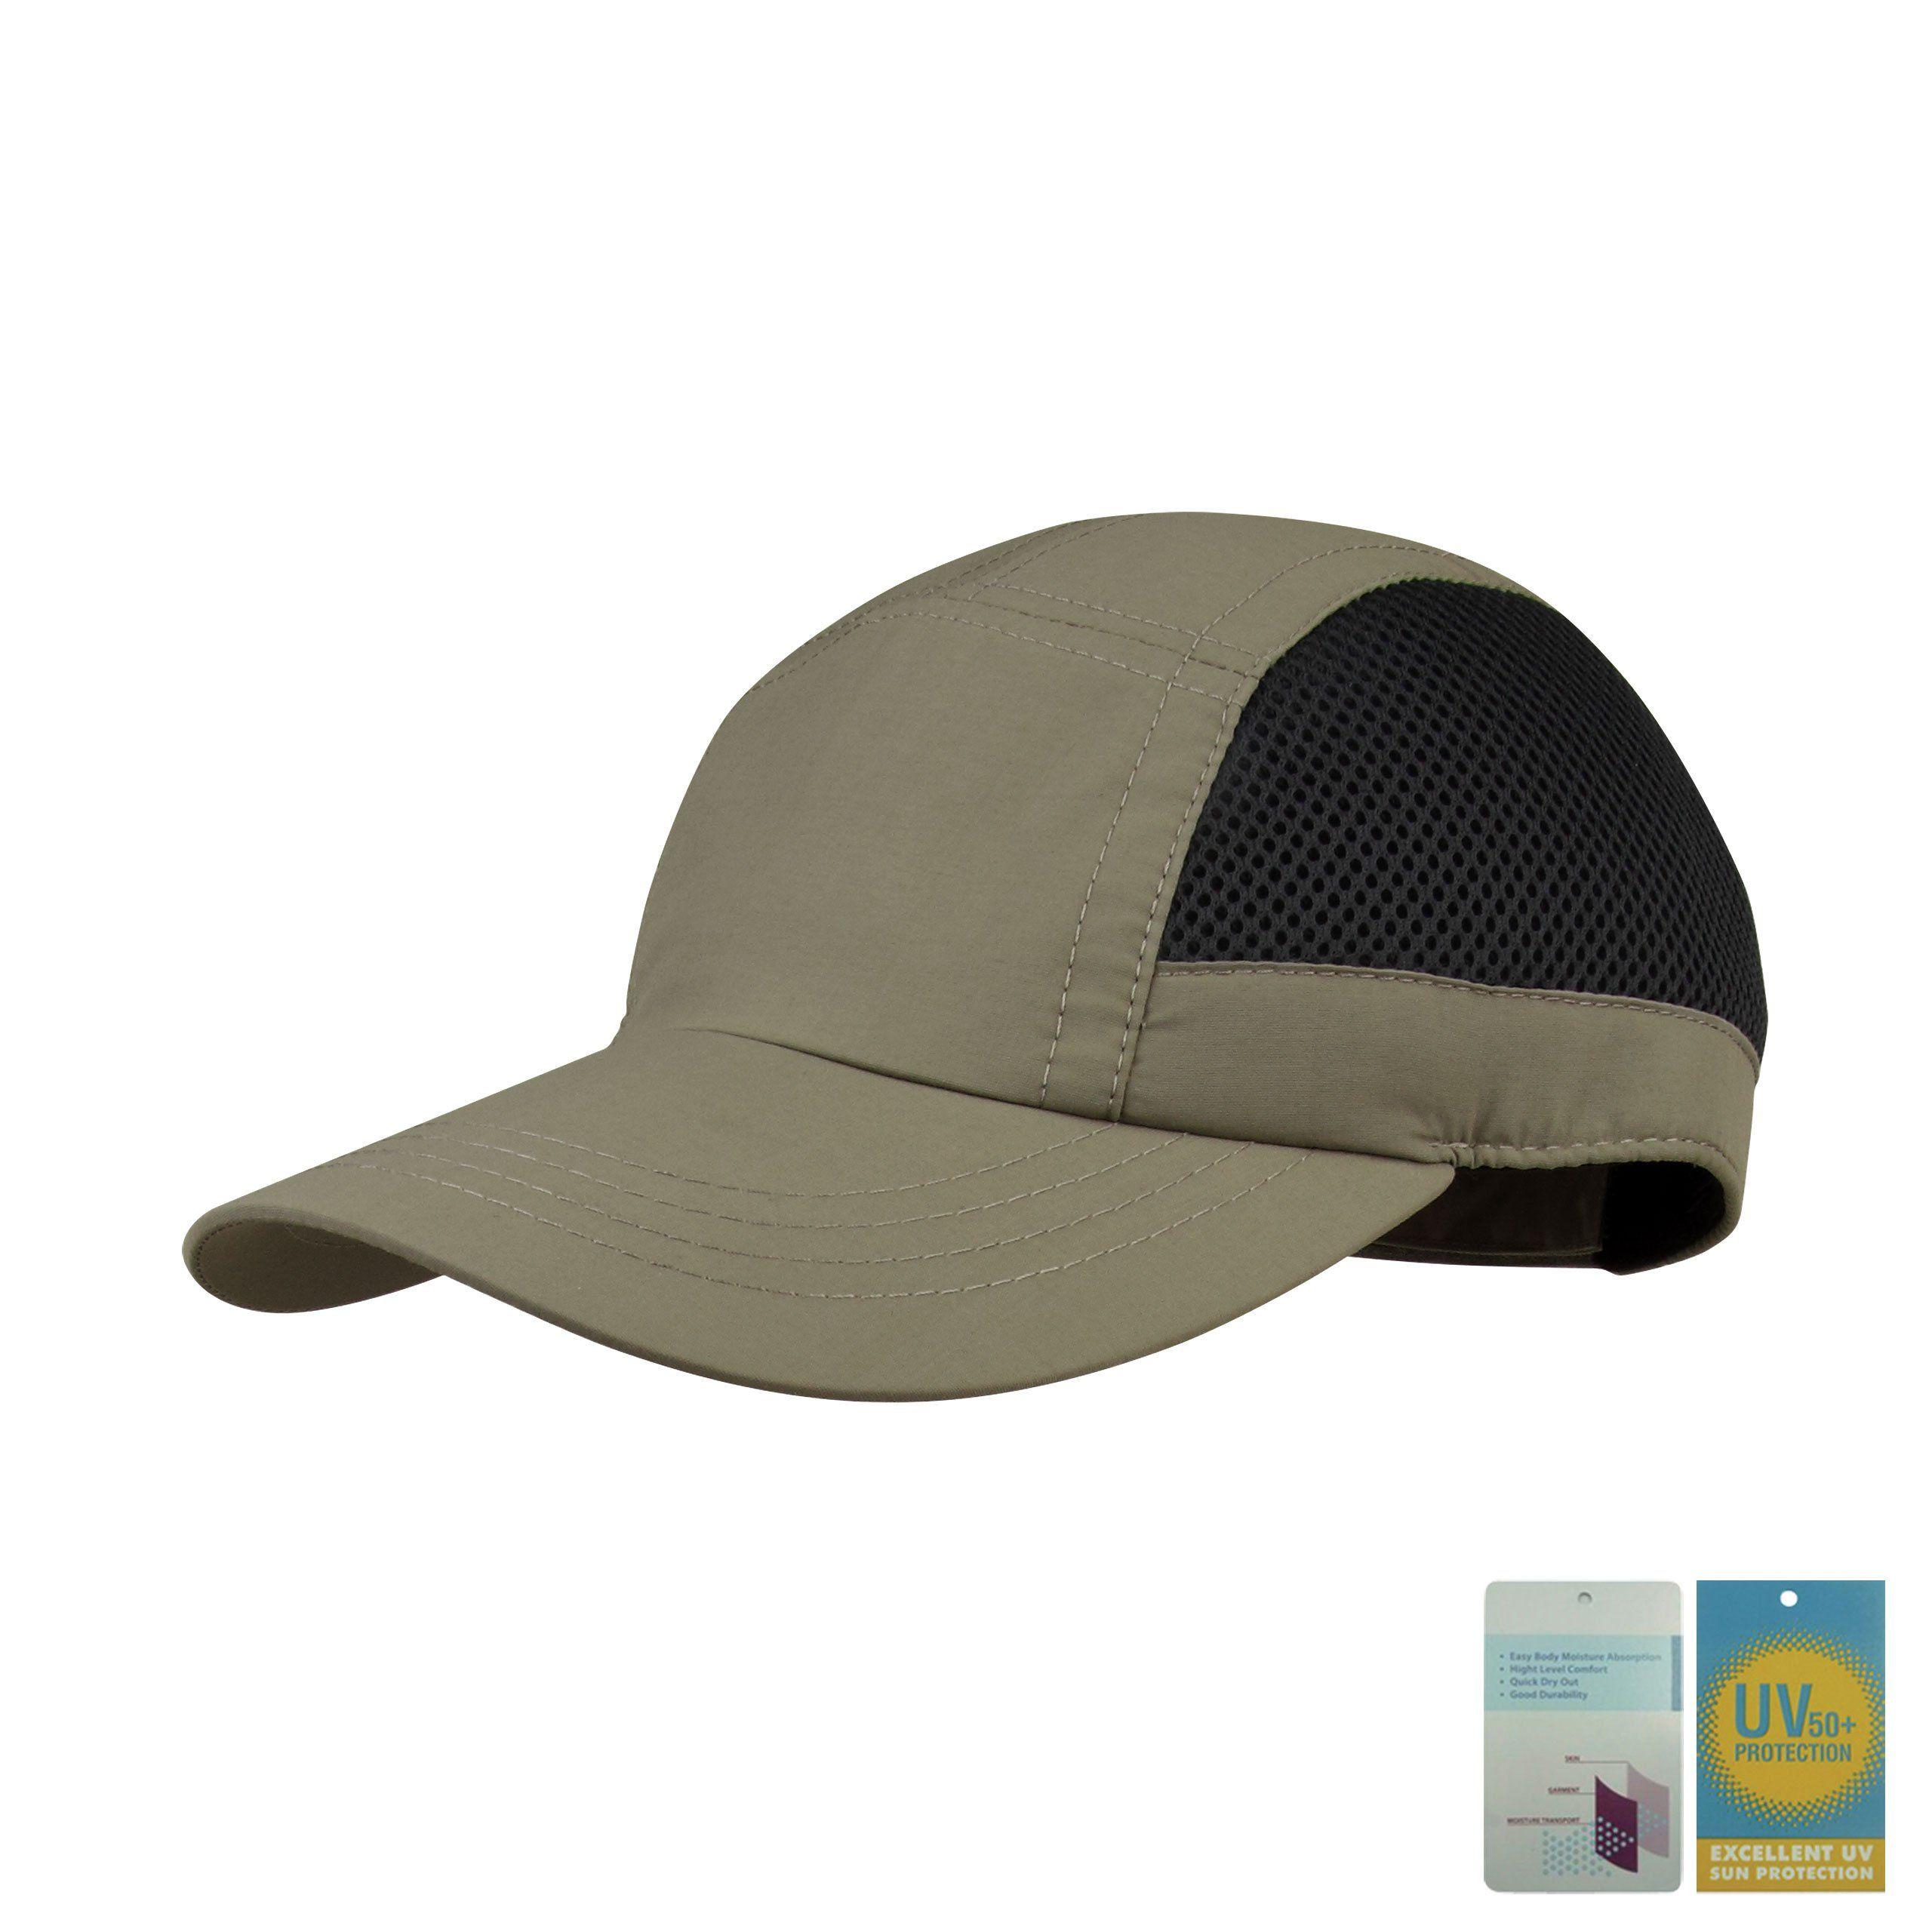 Juniper Casual Outdoor Cap One Size Stone Black Outdoor Cap Cap Sweatband